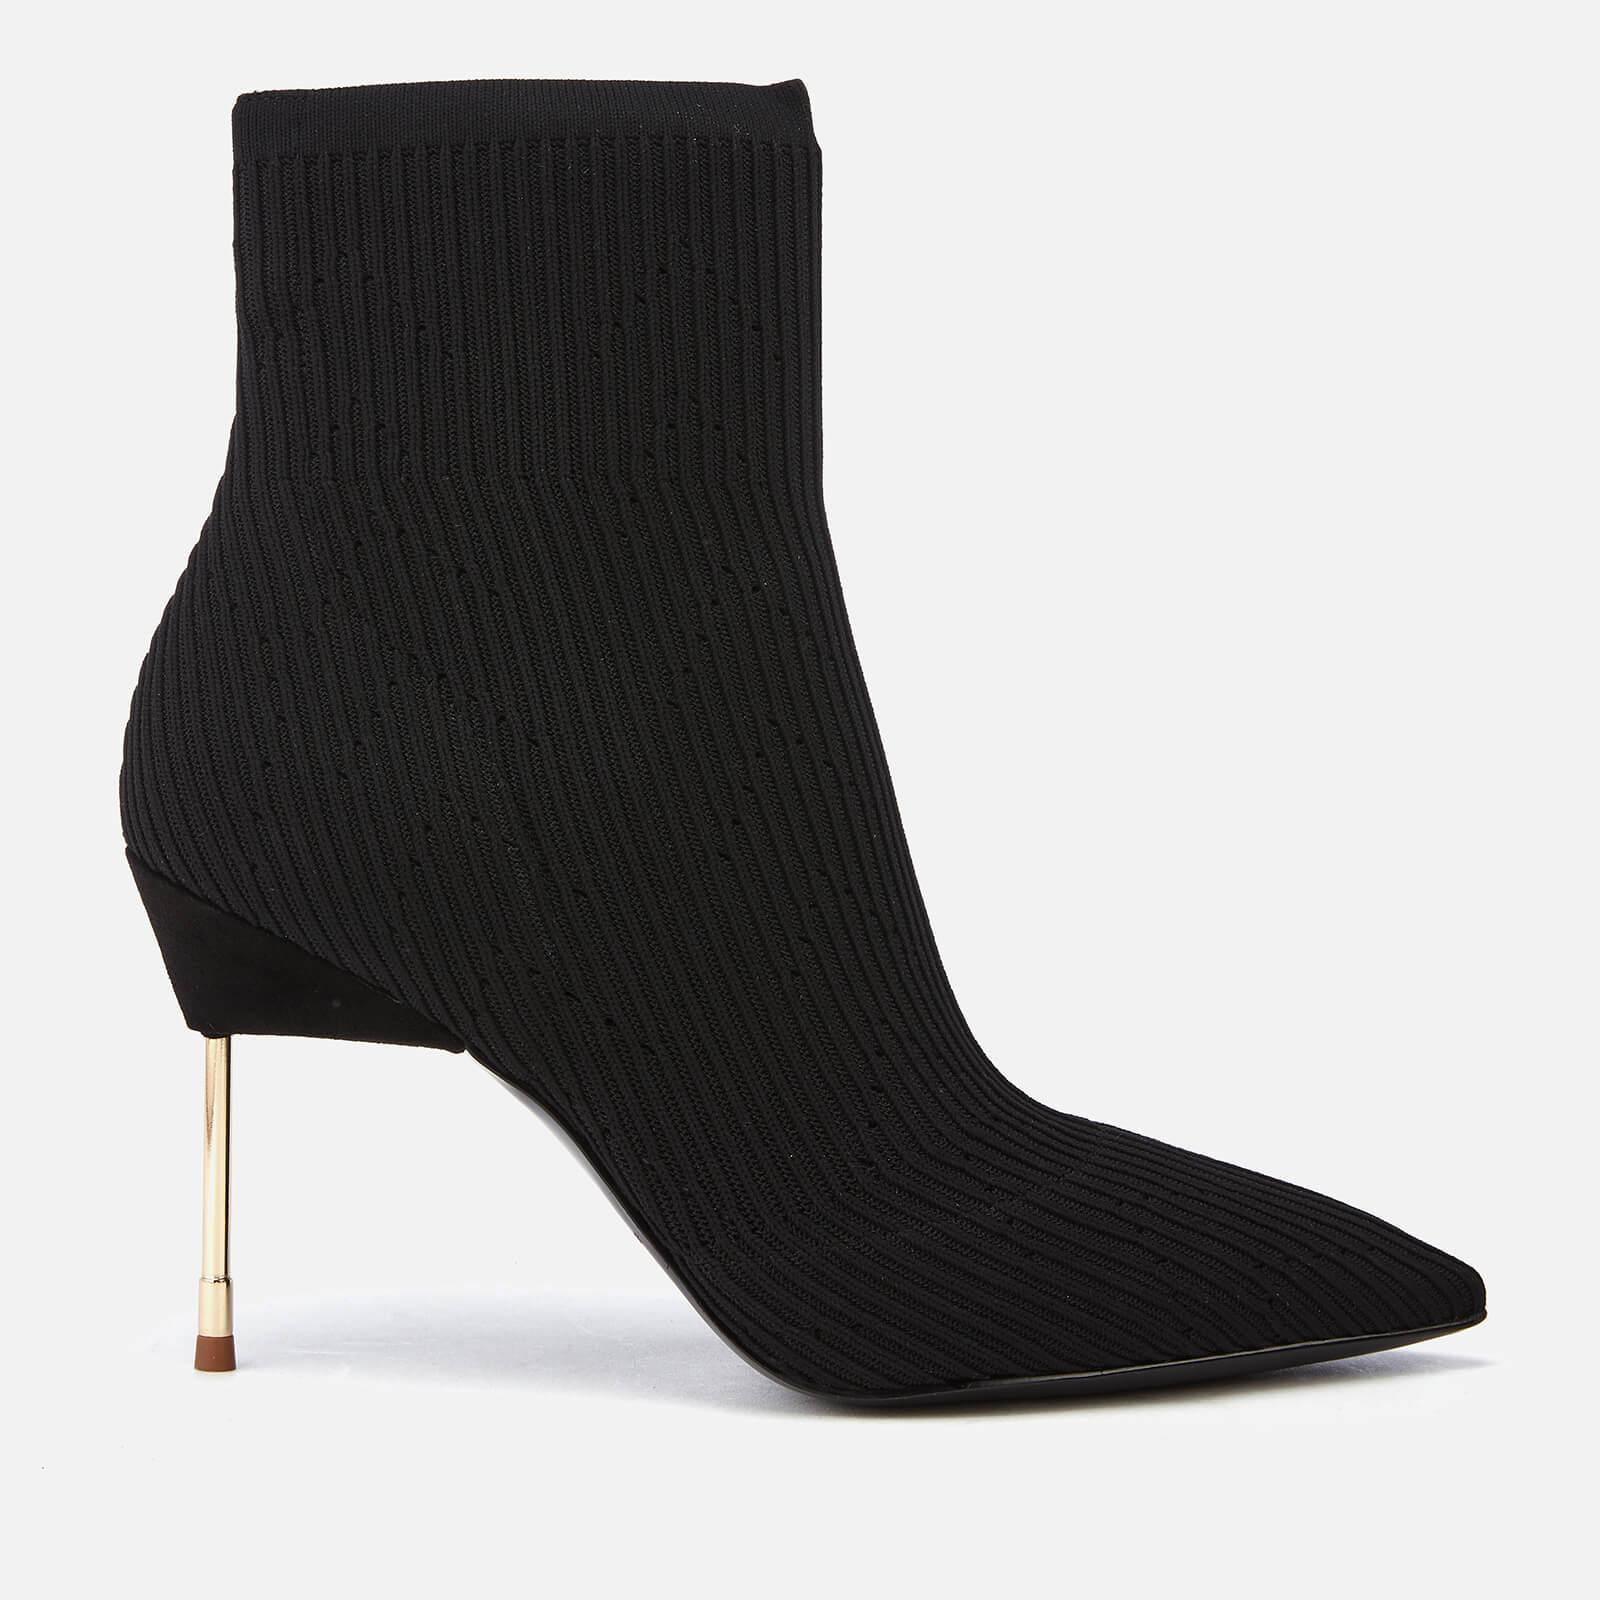 Kurt Geiger London Women's Barbican Stretch Heeled Ankle Boots - Black - UK 8